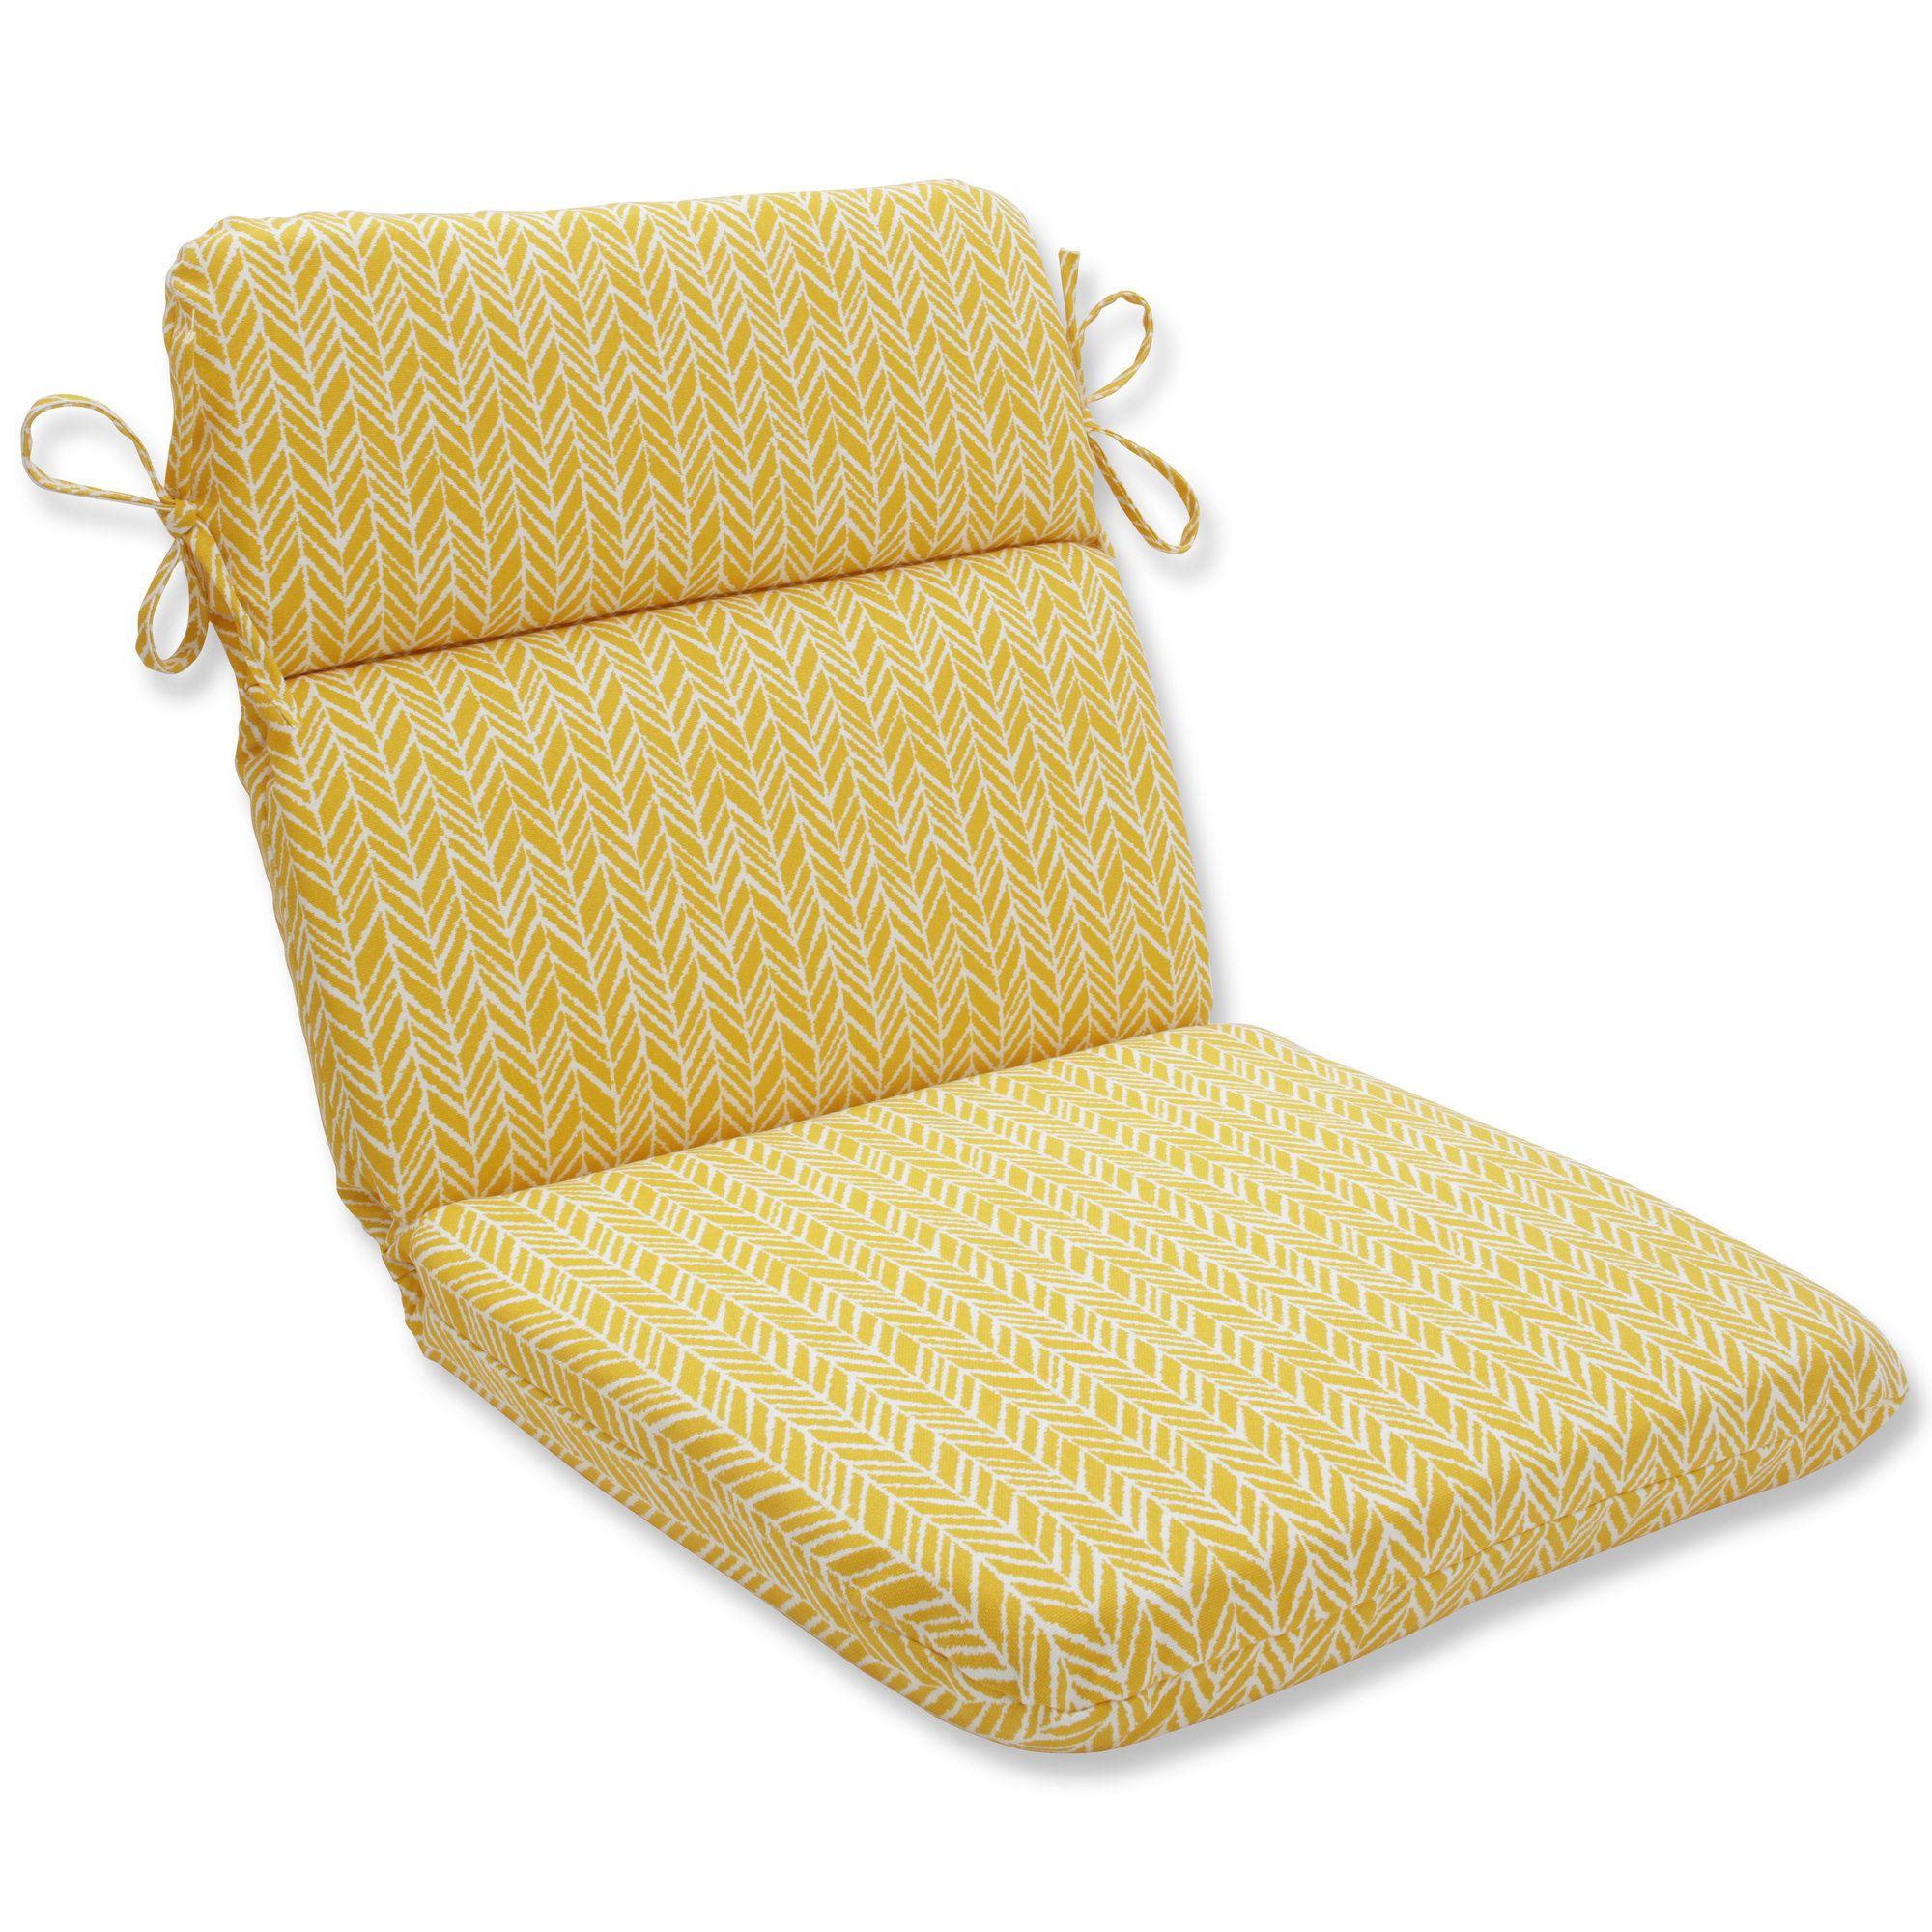 Herringbone outdoor dining chair cushion dining chair cushions